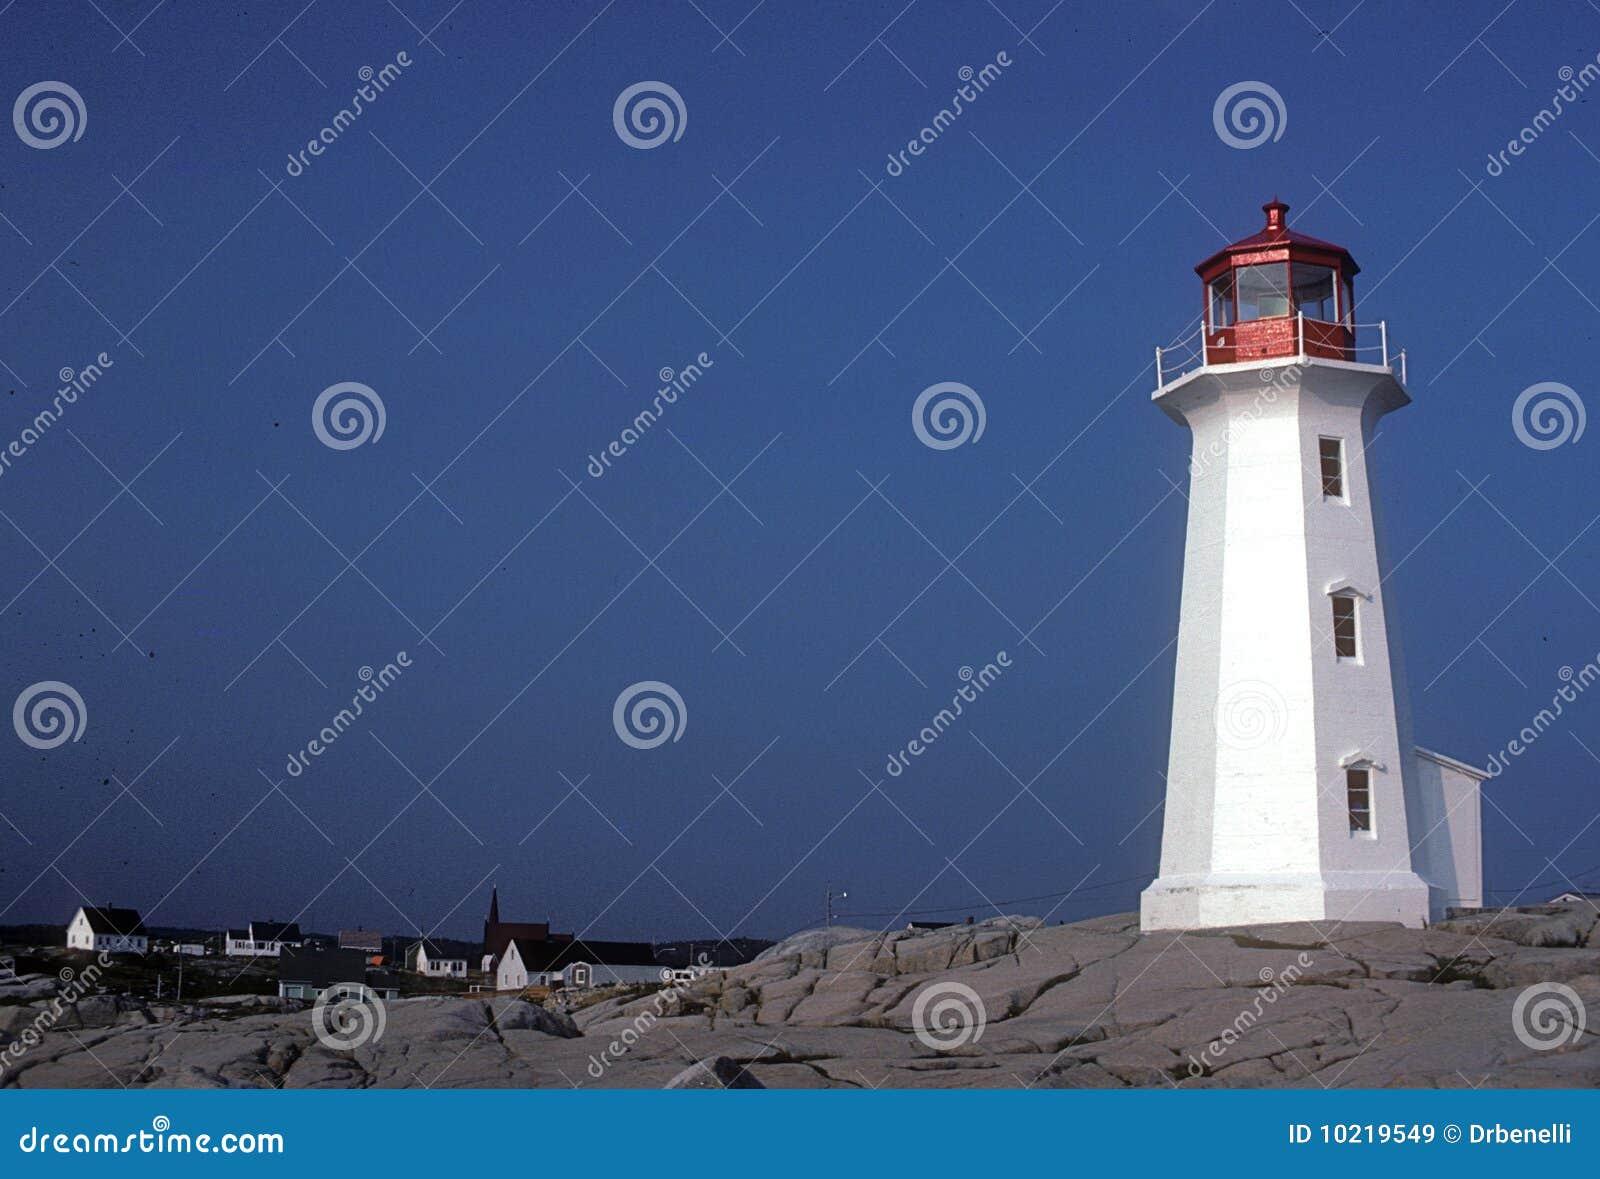 peggy u0026 39 s cove lighthouse